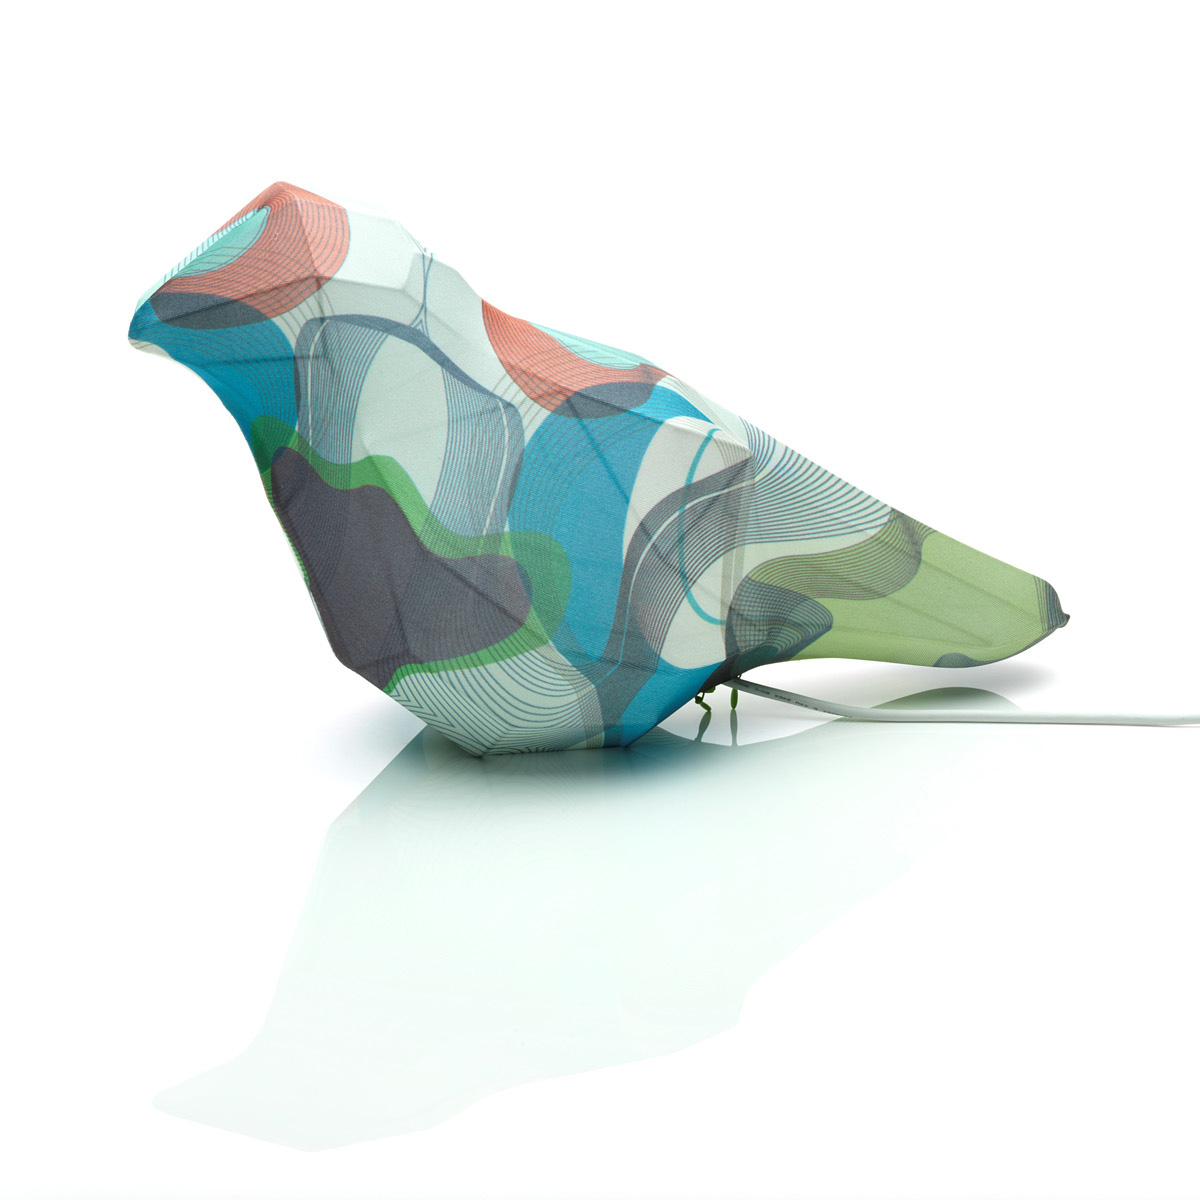 Alessi_I_Love_Animals_Blue_Bird_off